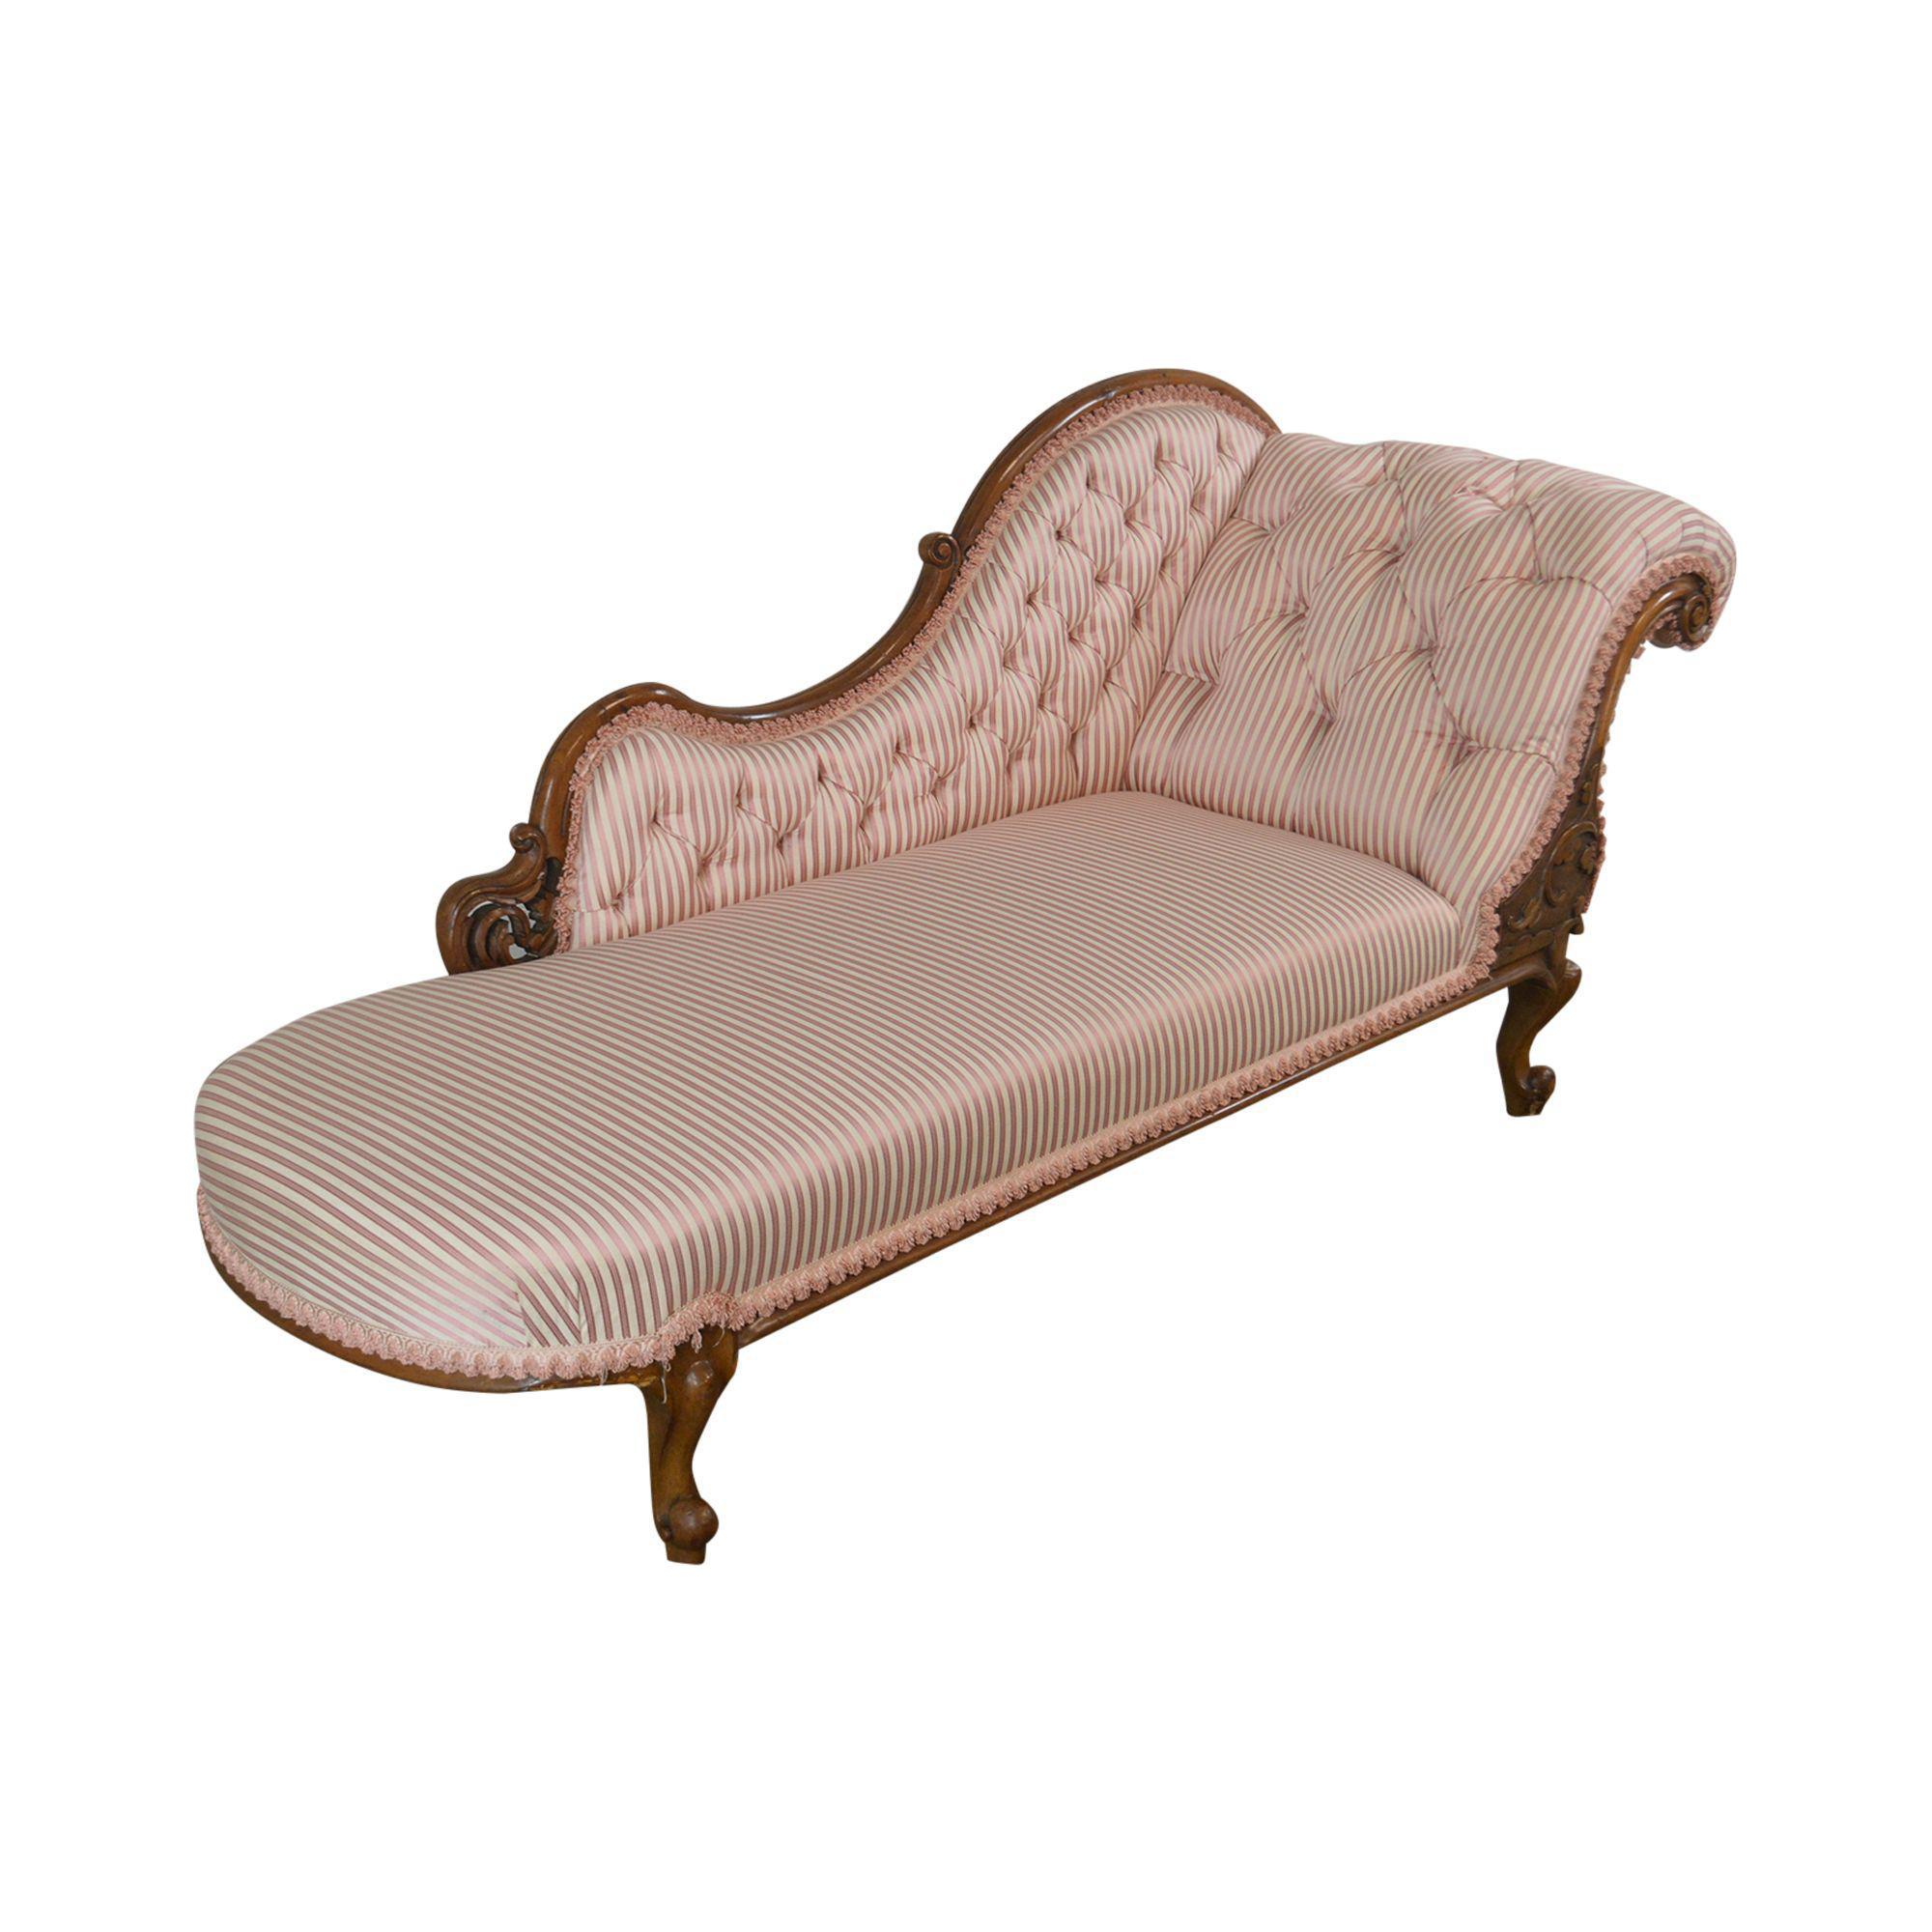 - Victorian Antique Walnut Tufted Chaise Lounge Chairish